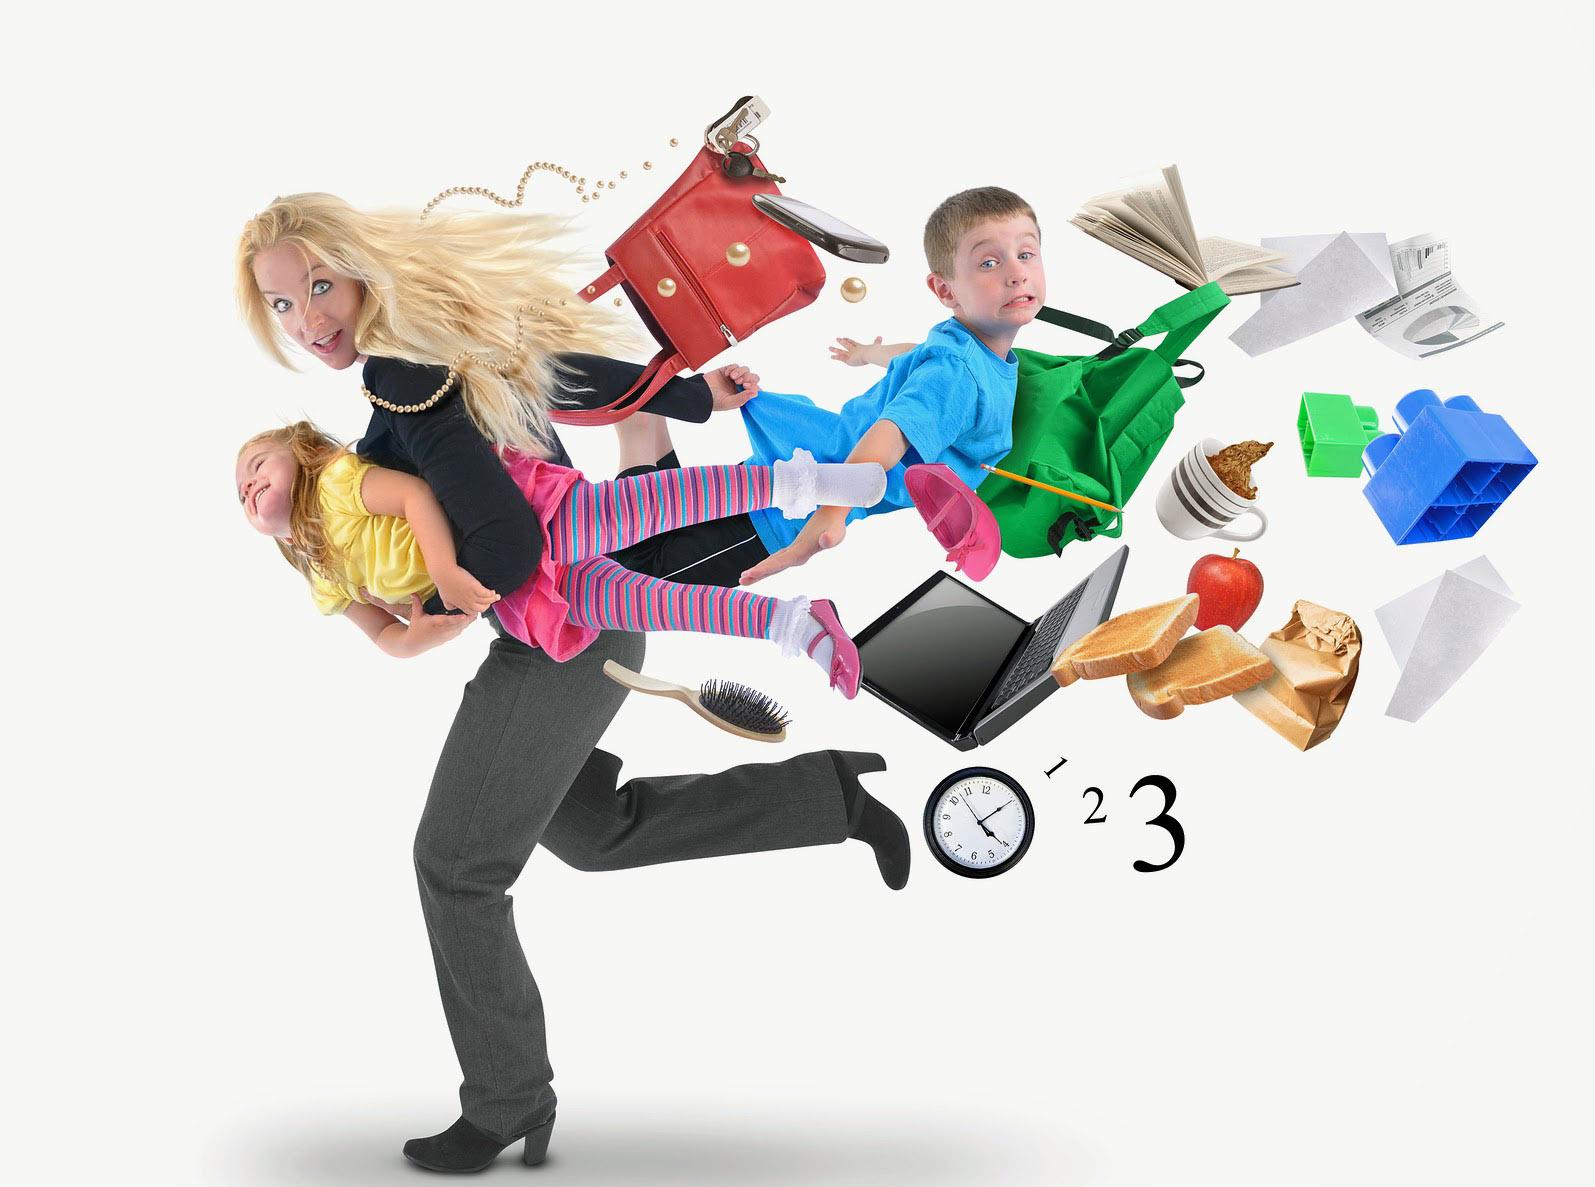 Donne multitasking: dibattito al Museo del risparmio